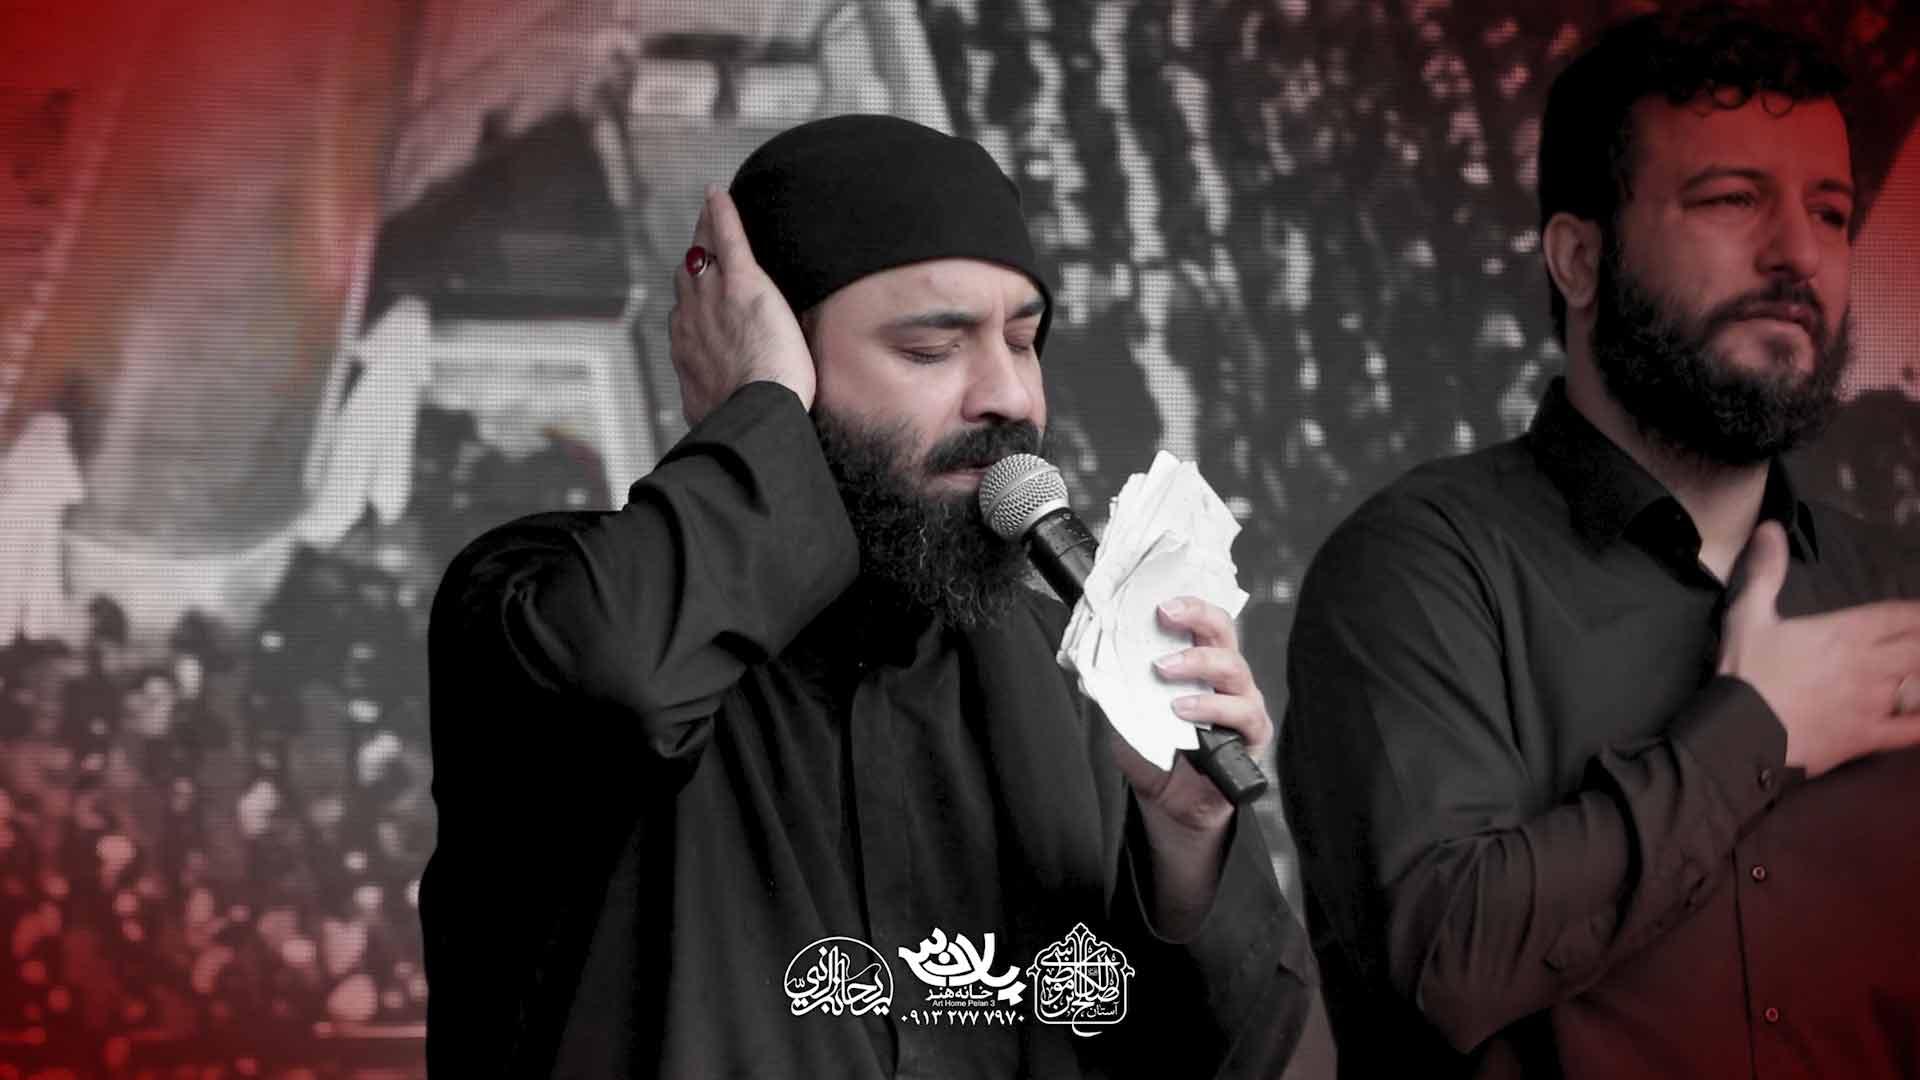 چه غروب غم انگیزی عبدالرضا هلالی